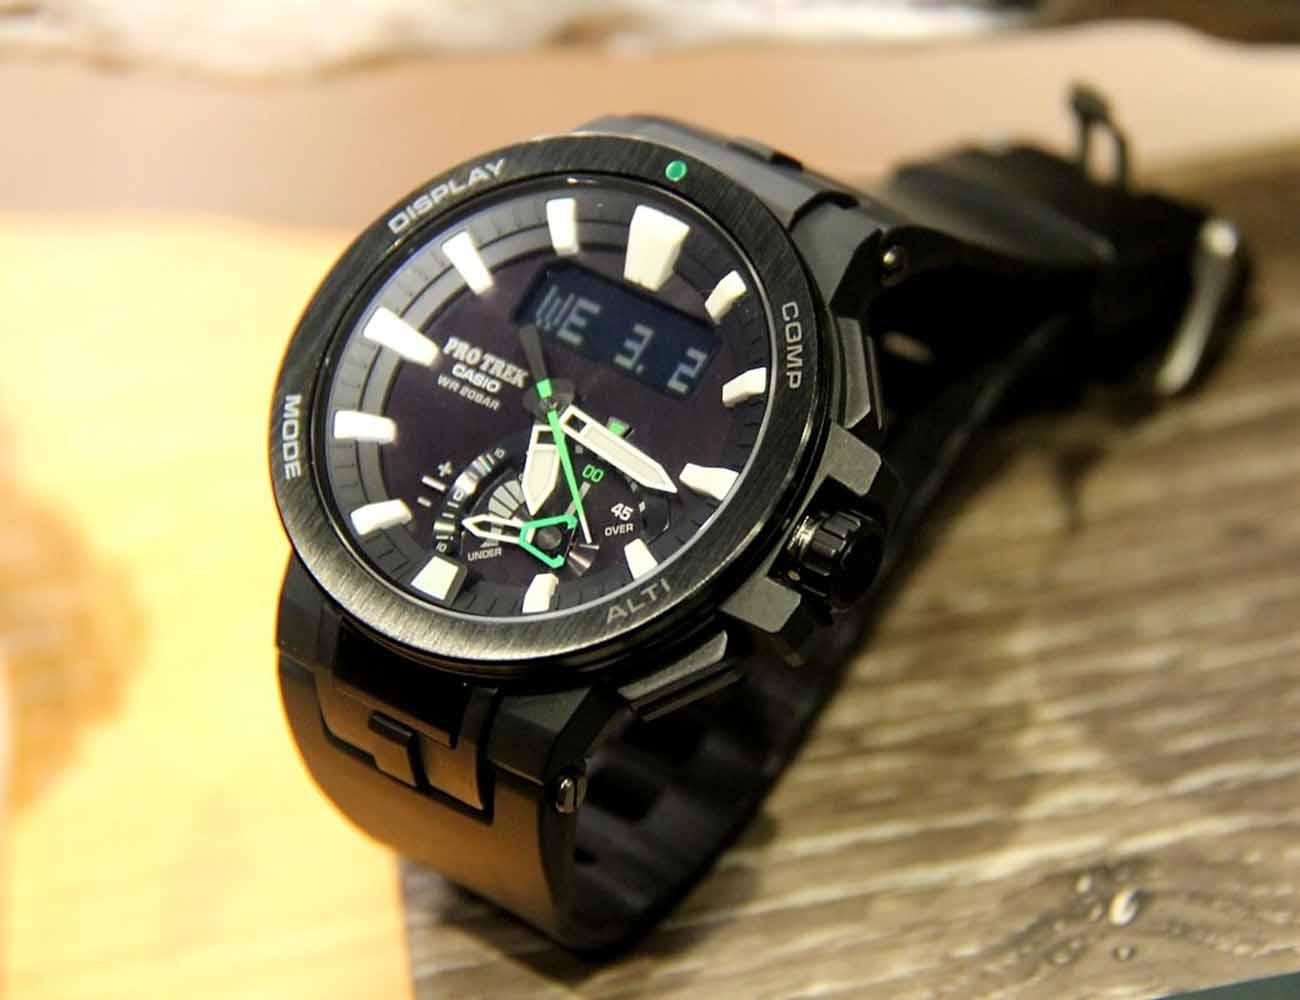 ProTrek PRW-7000 Watch by Casio